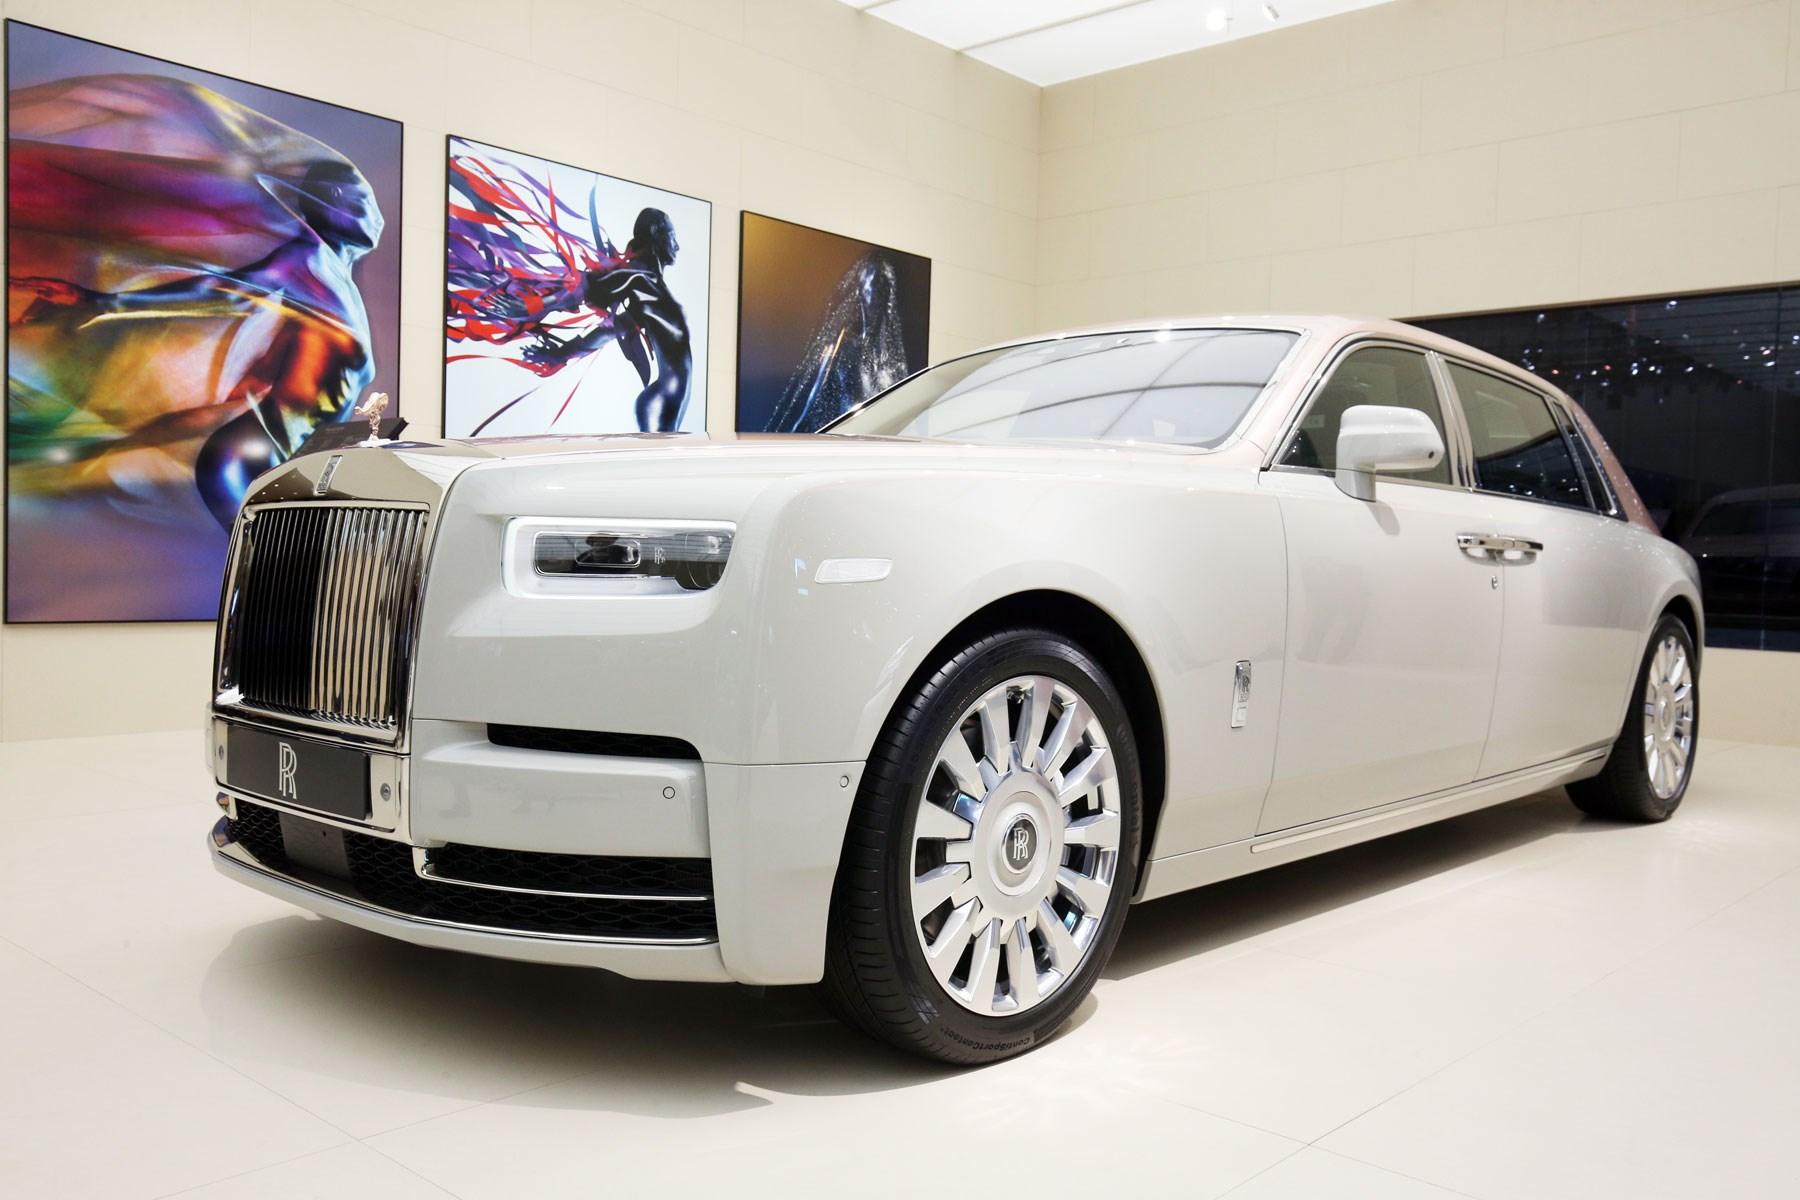 Rolls Royce Showcase Three Unique Phantoms And Dawn Aero